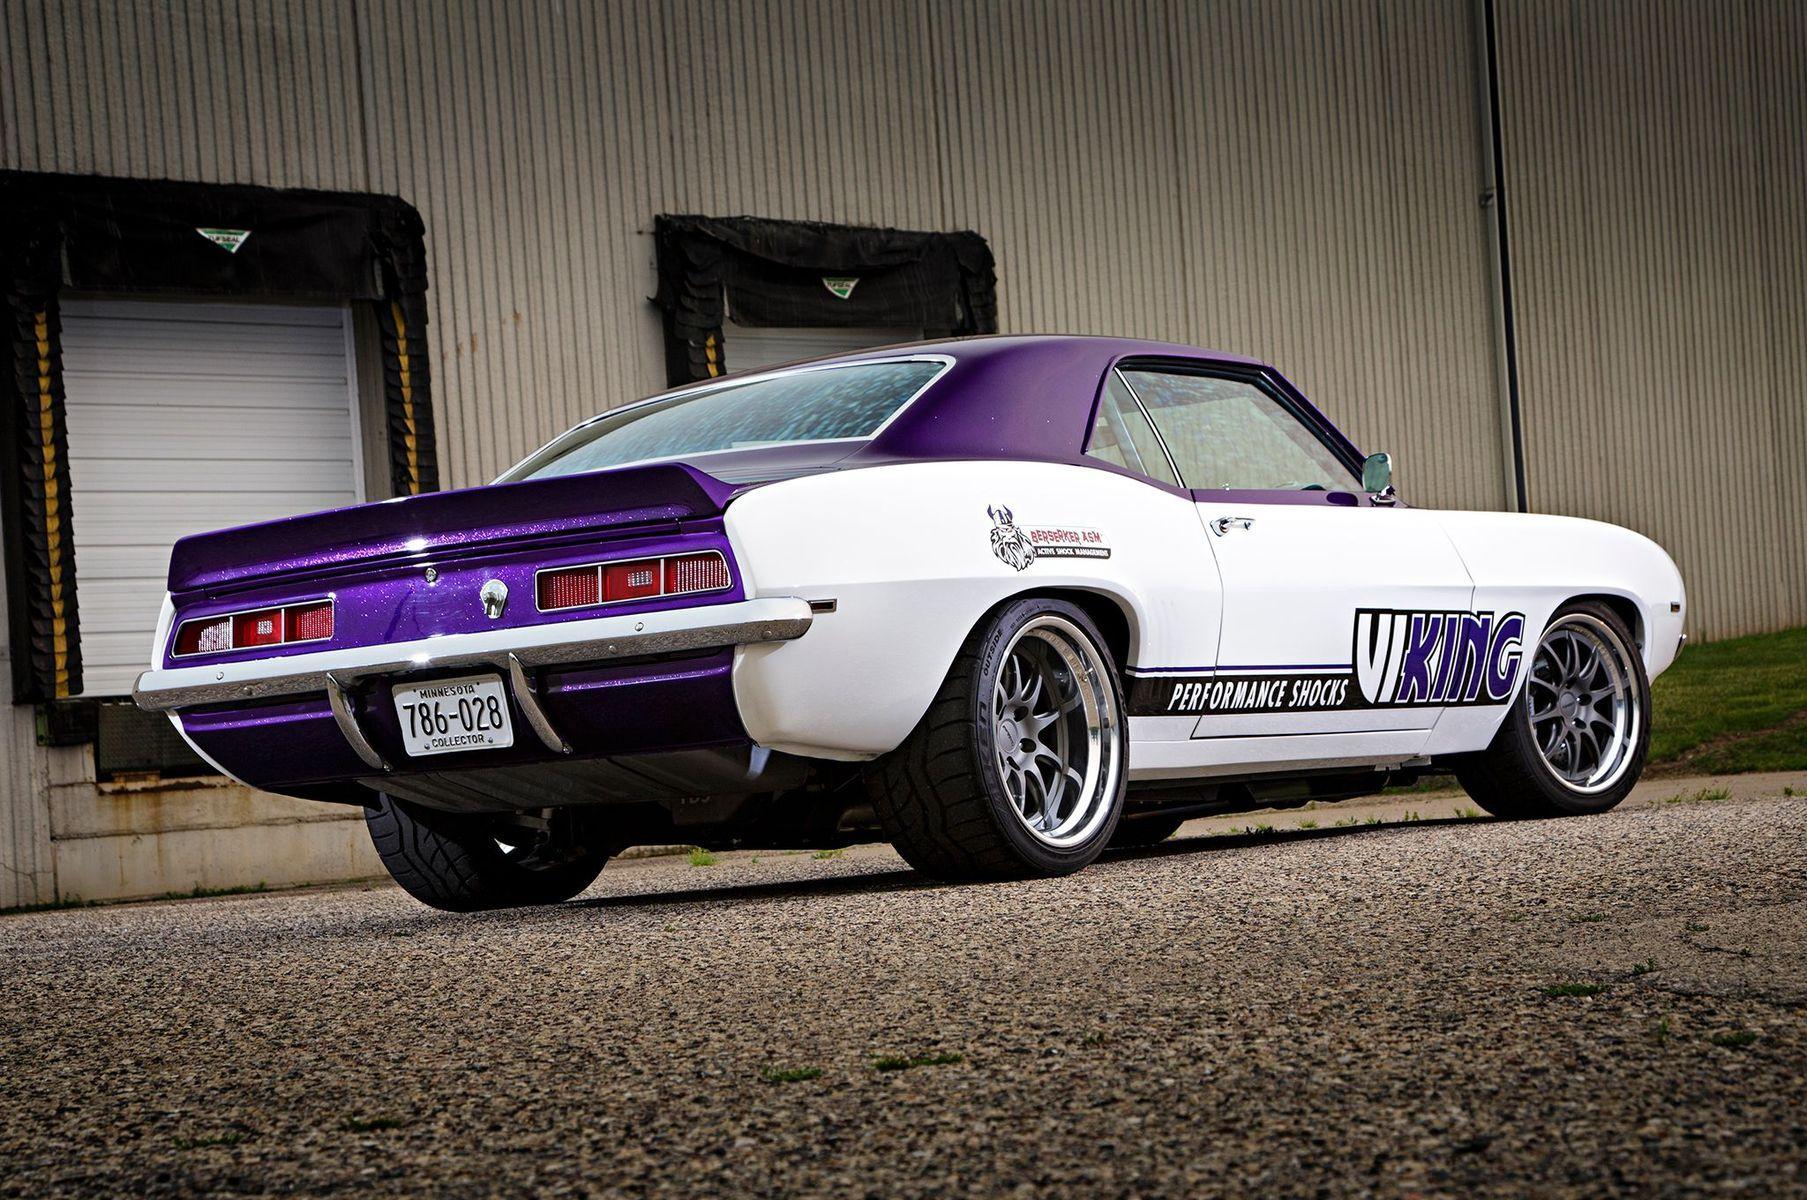 1969 Chevrolet Camaro | The Viking Performance Berserker '69 Camaro on Forgeline GZ3 Wheels